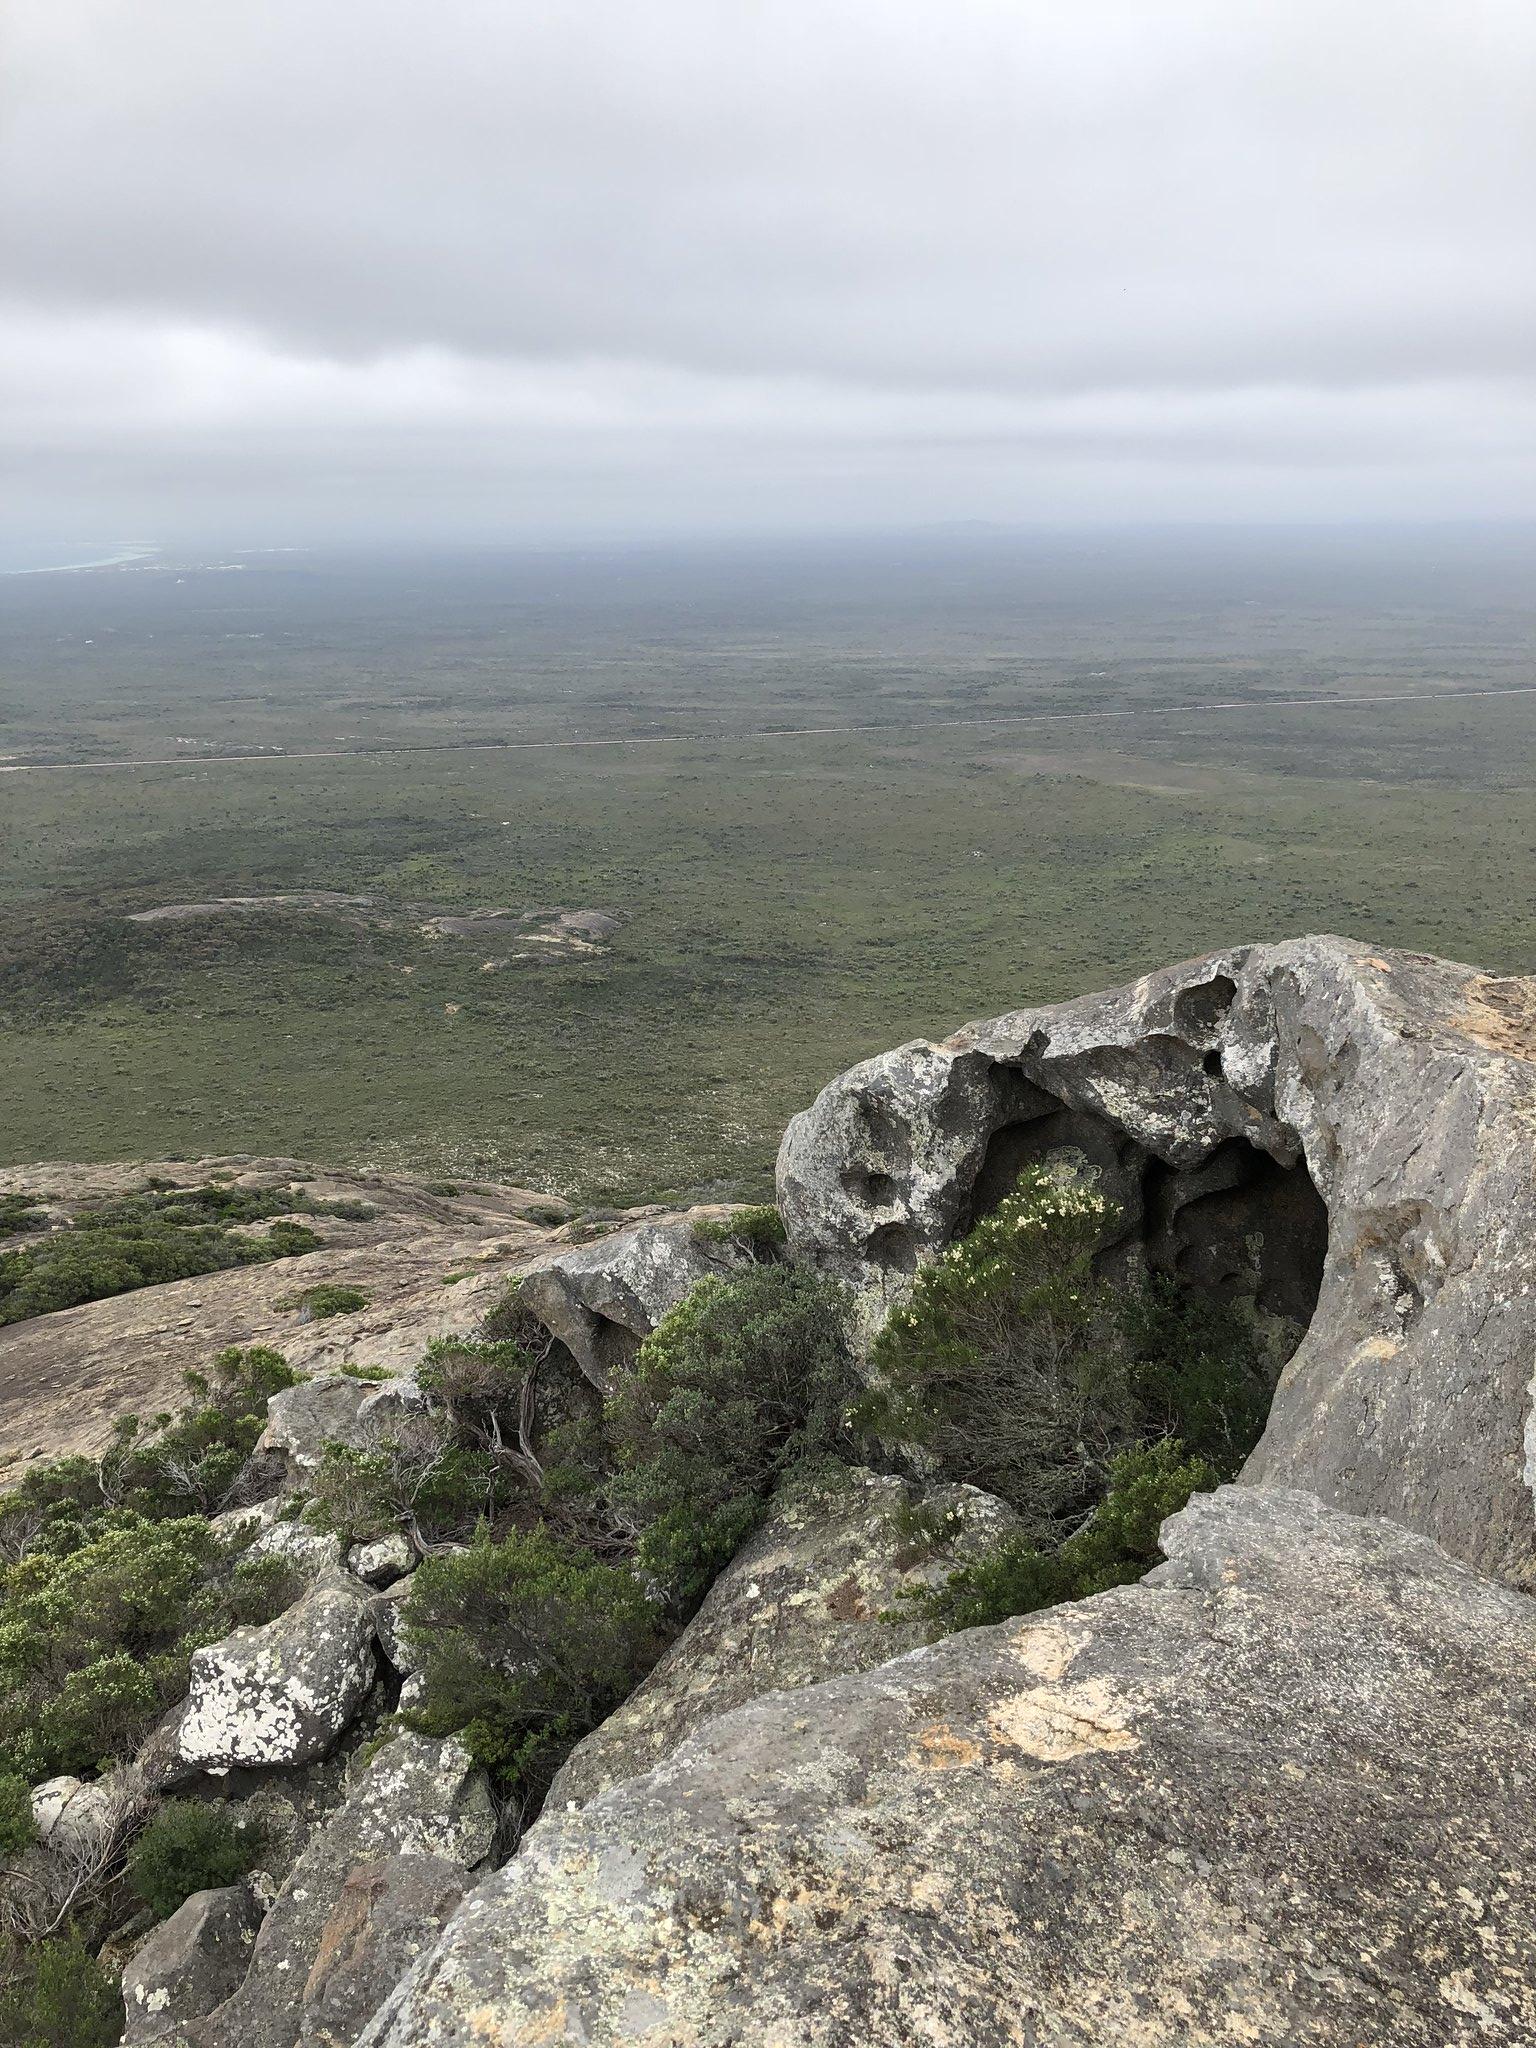 Frenchman Peak